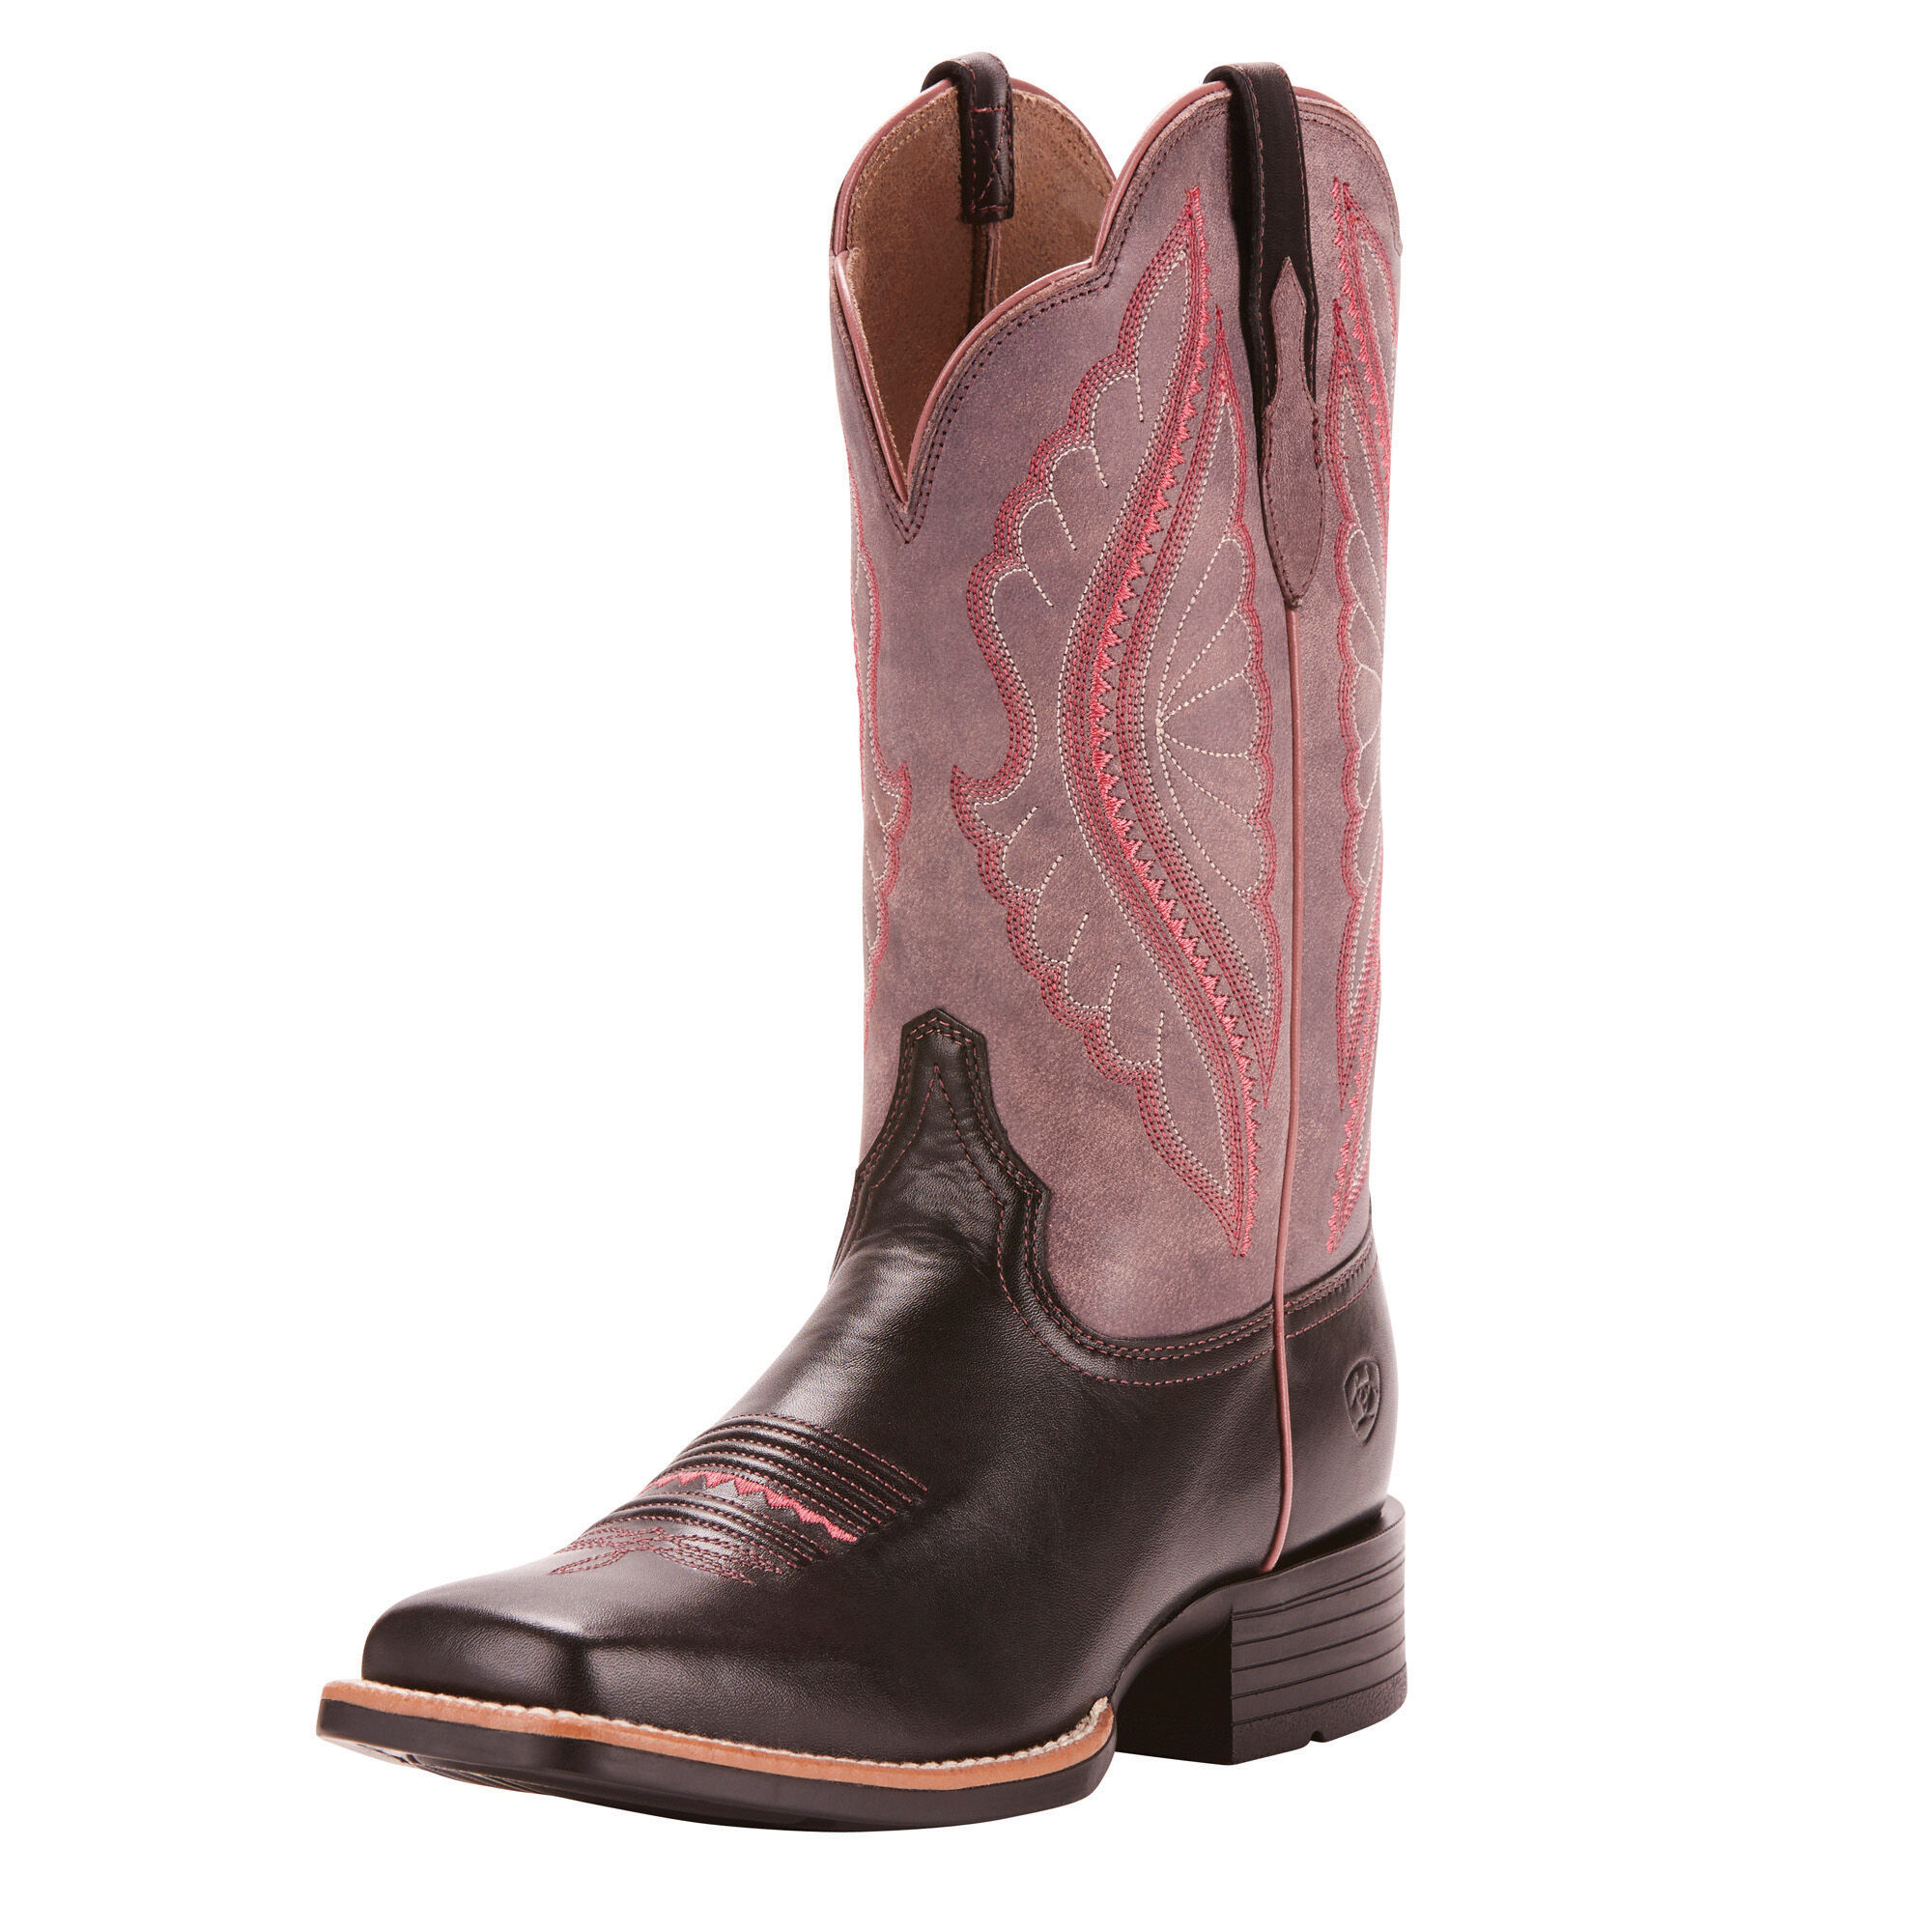 western western western western femmeAriat femmeAriat femmeAriat Chaussures Chaussures Chaussures femmeAriat Chaussures Fc1JlK